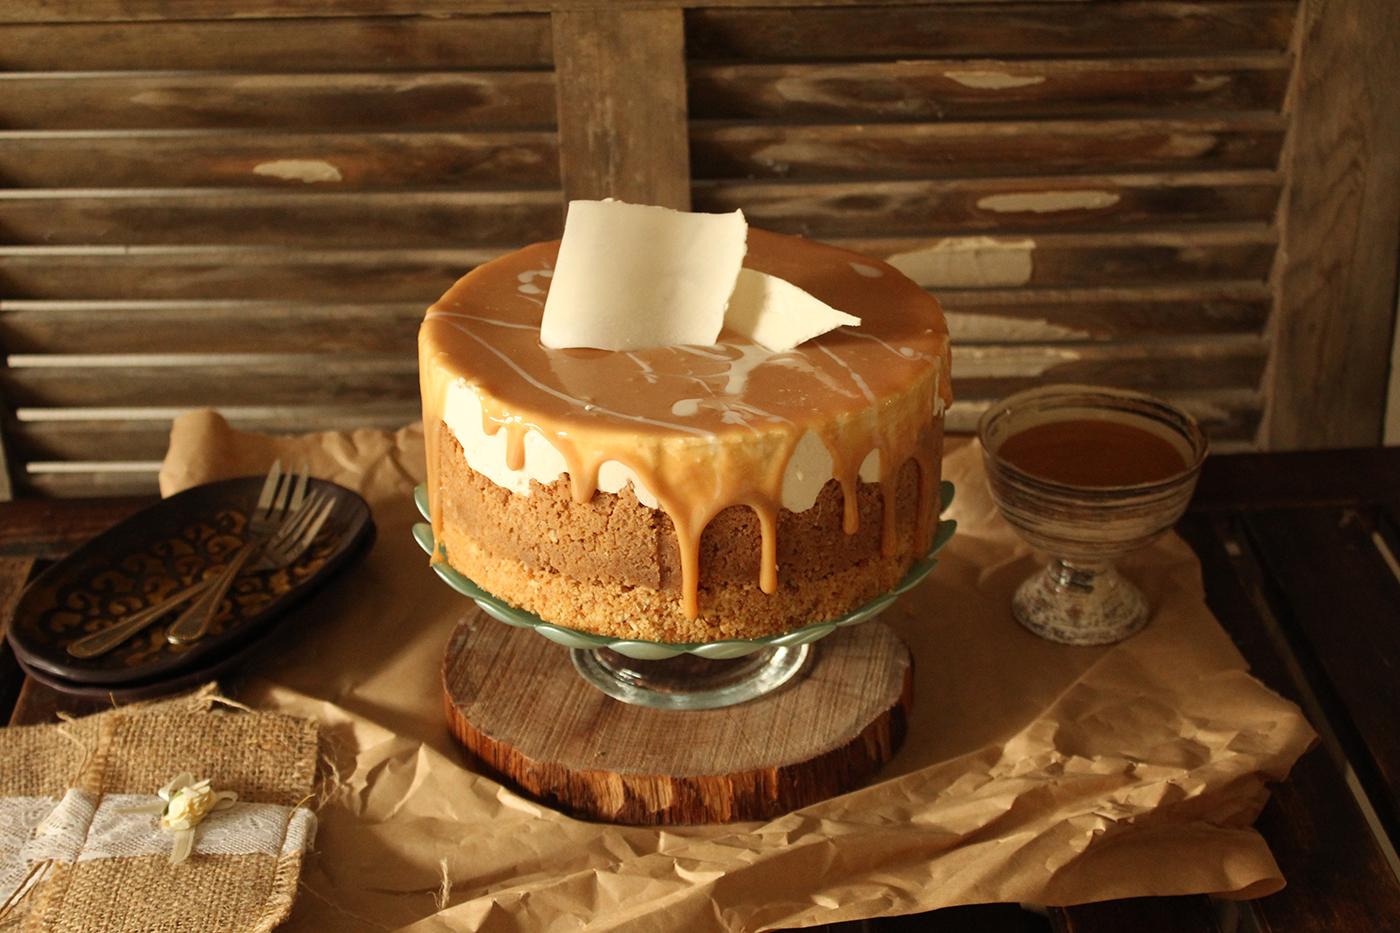 IMG 8308 - עוגת גבינה בציפוי ריבת חלב